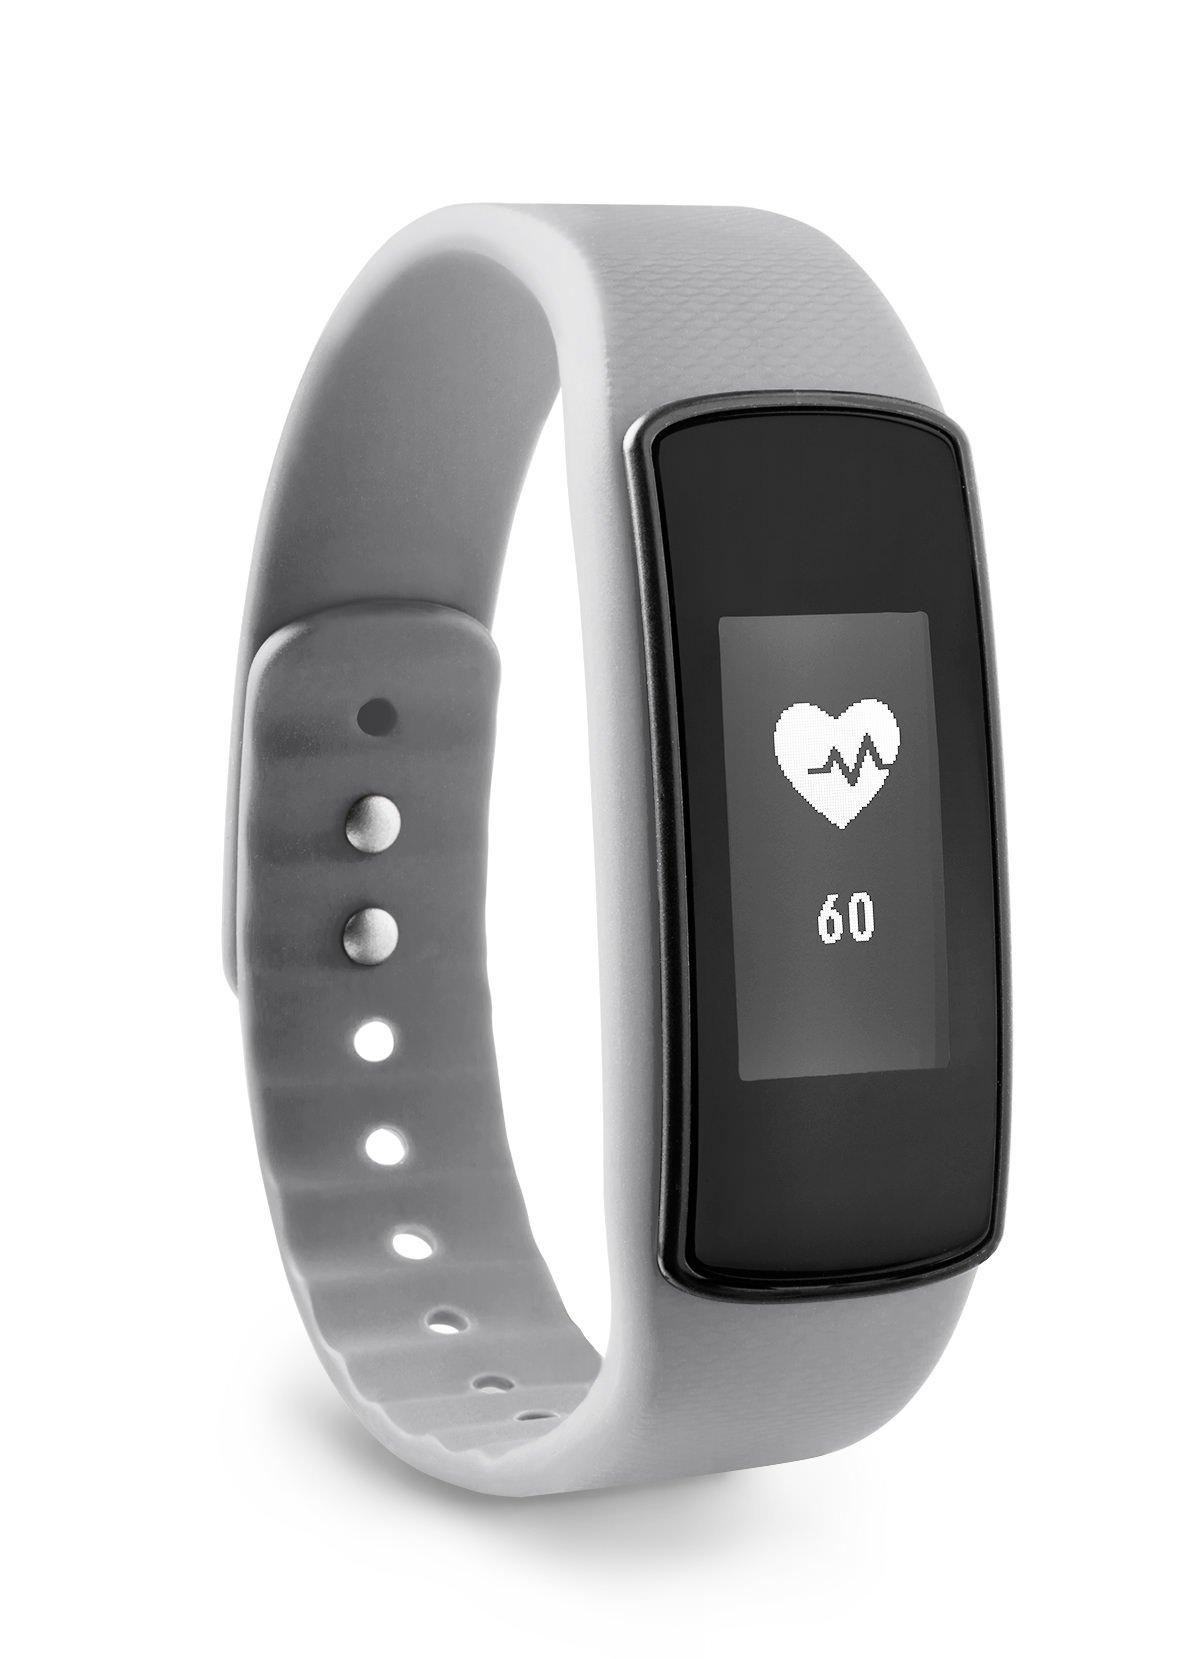 ADE Unisex's Fit Vigo Smart Activity Tracker